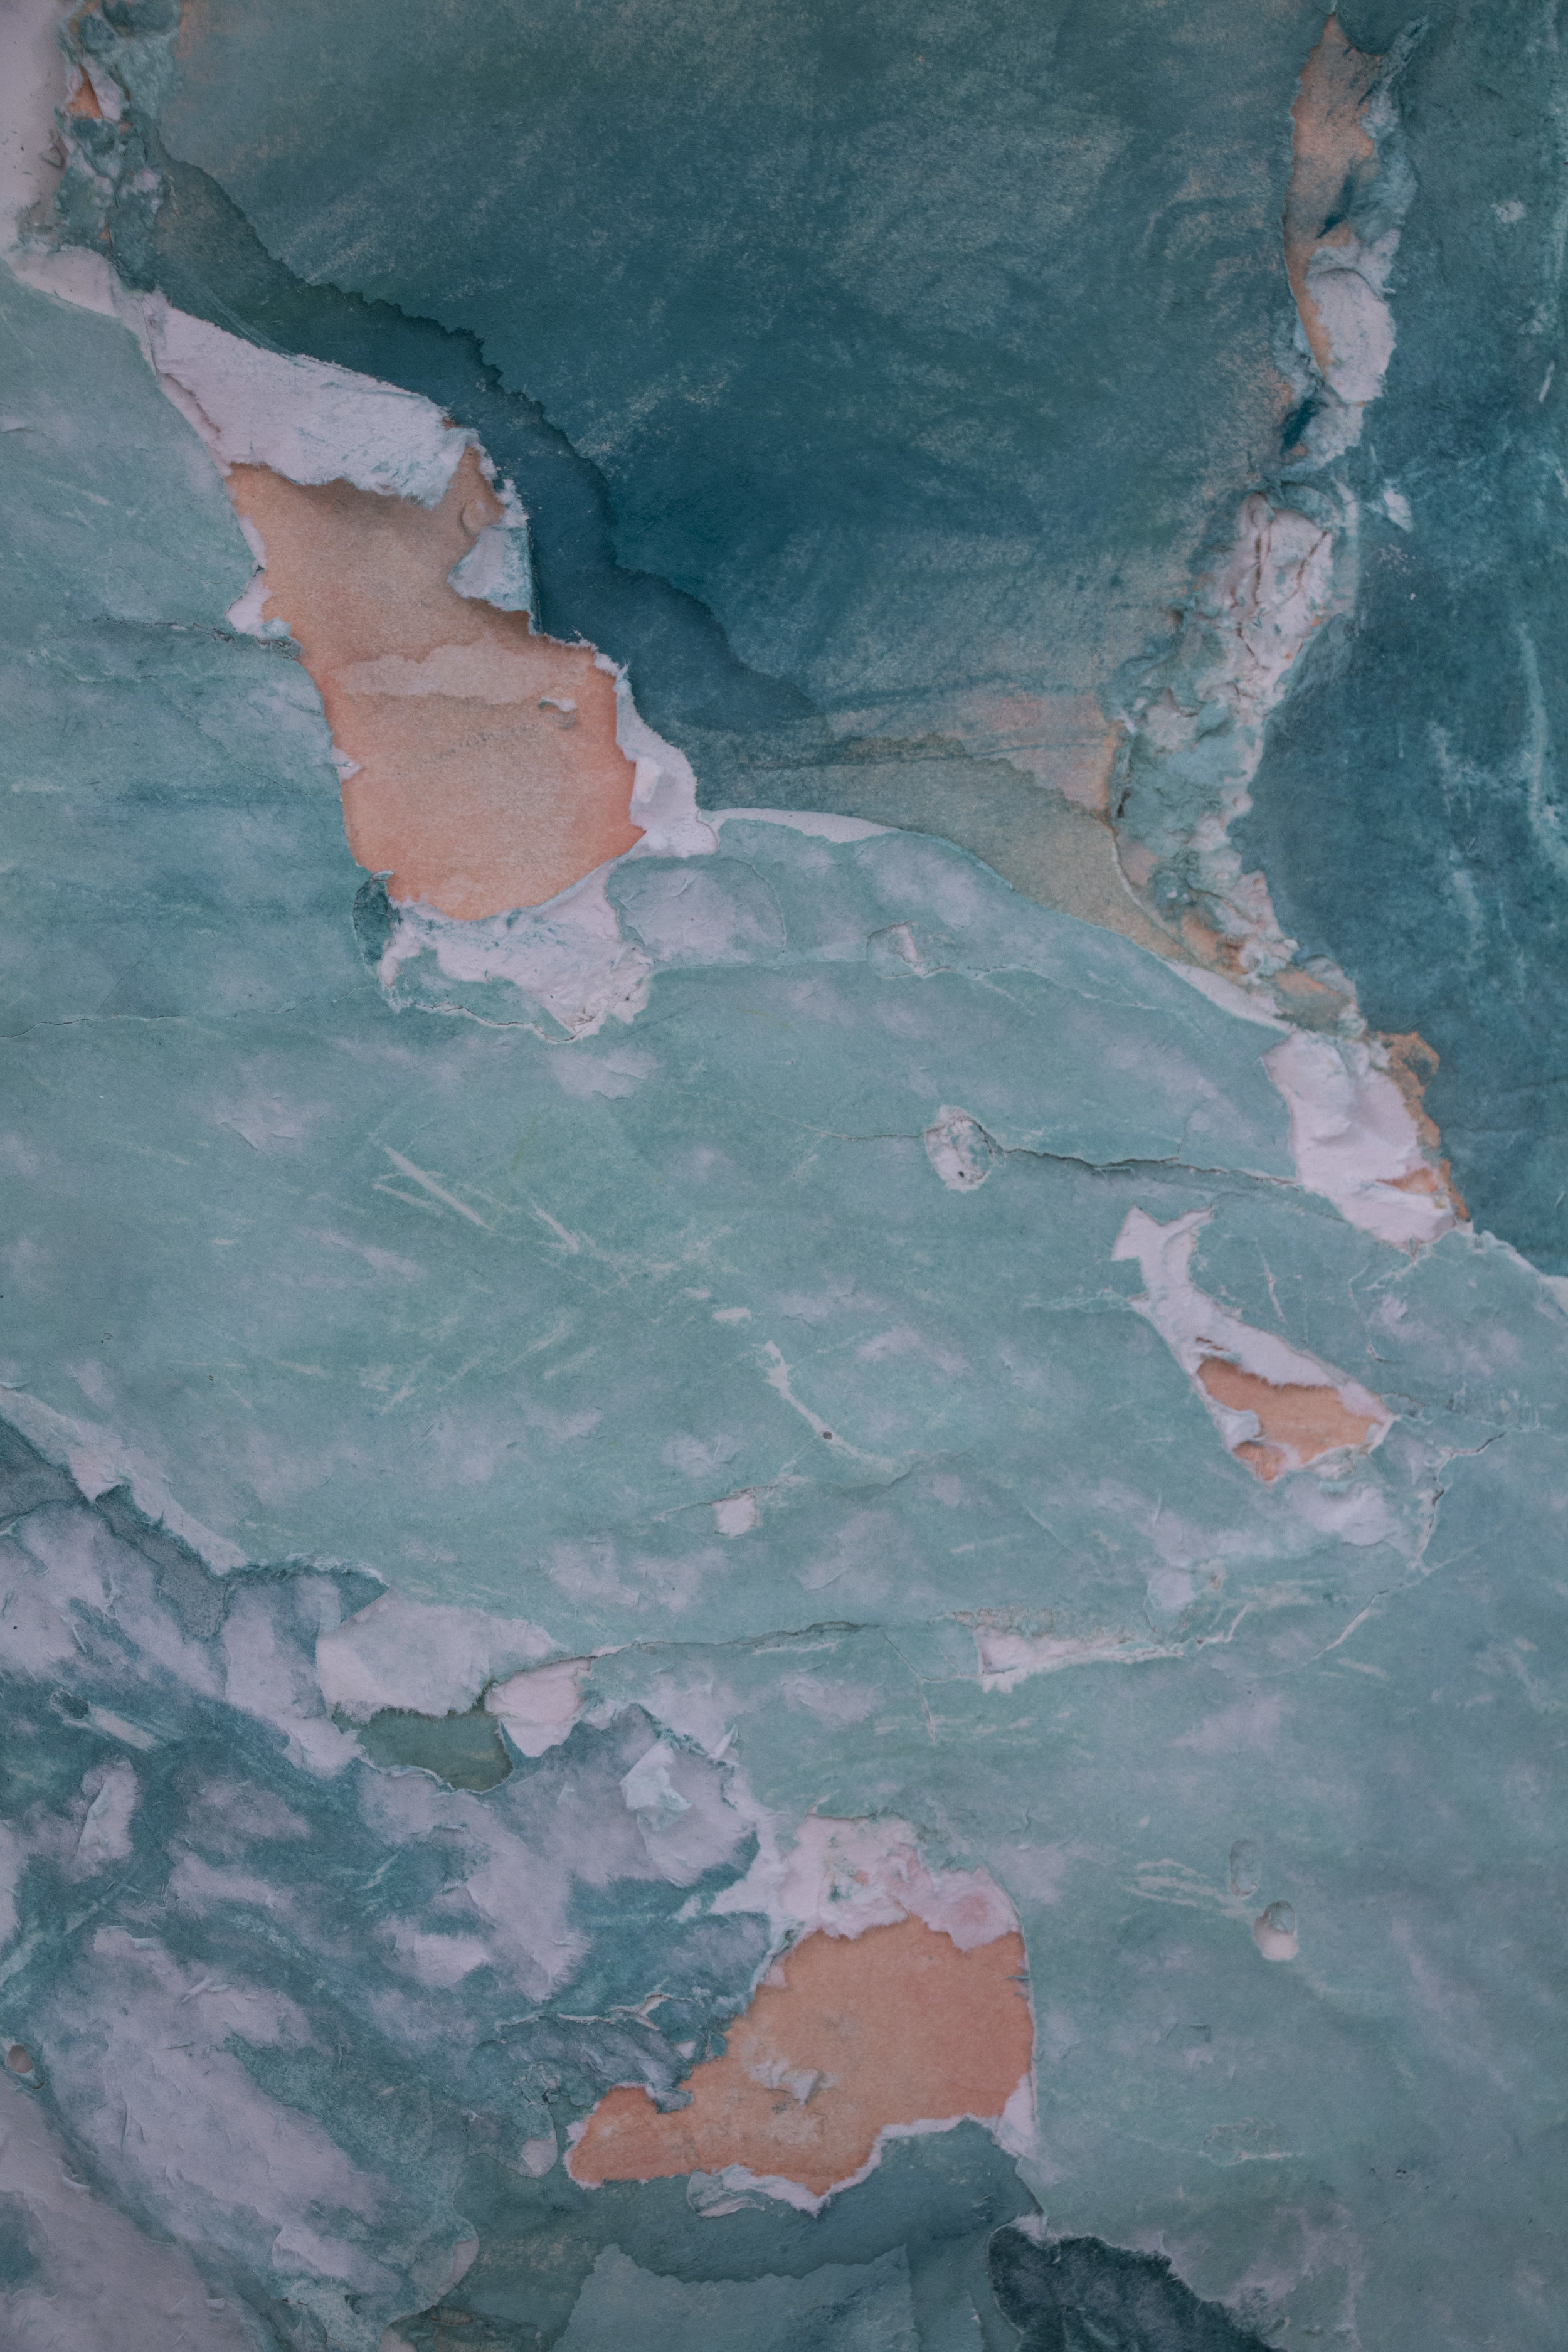 Ann Iren Buan, Castles (Dark Aqua), 2018. Detalj. Tørrpastell, papir, gips, Acrylic One, armering. Foto: Aage A. Mikalsen / Kunsthall Trondheim